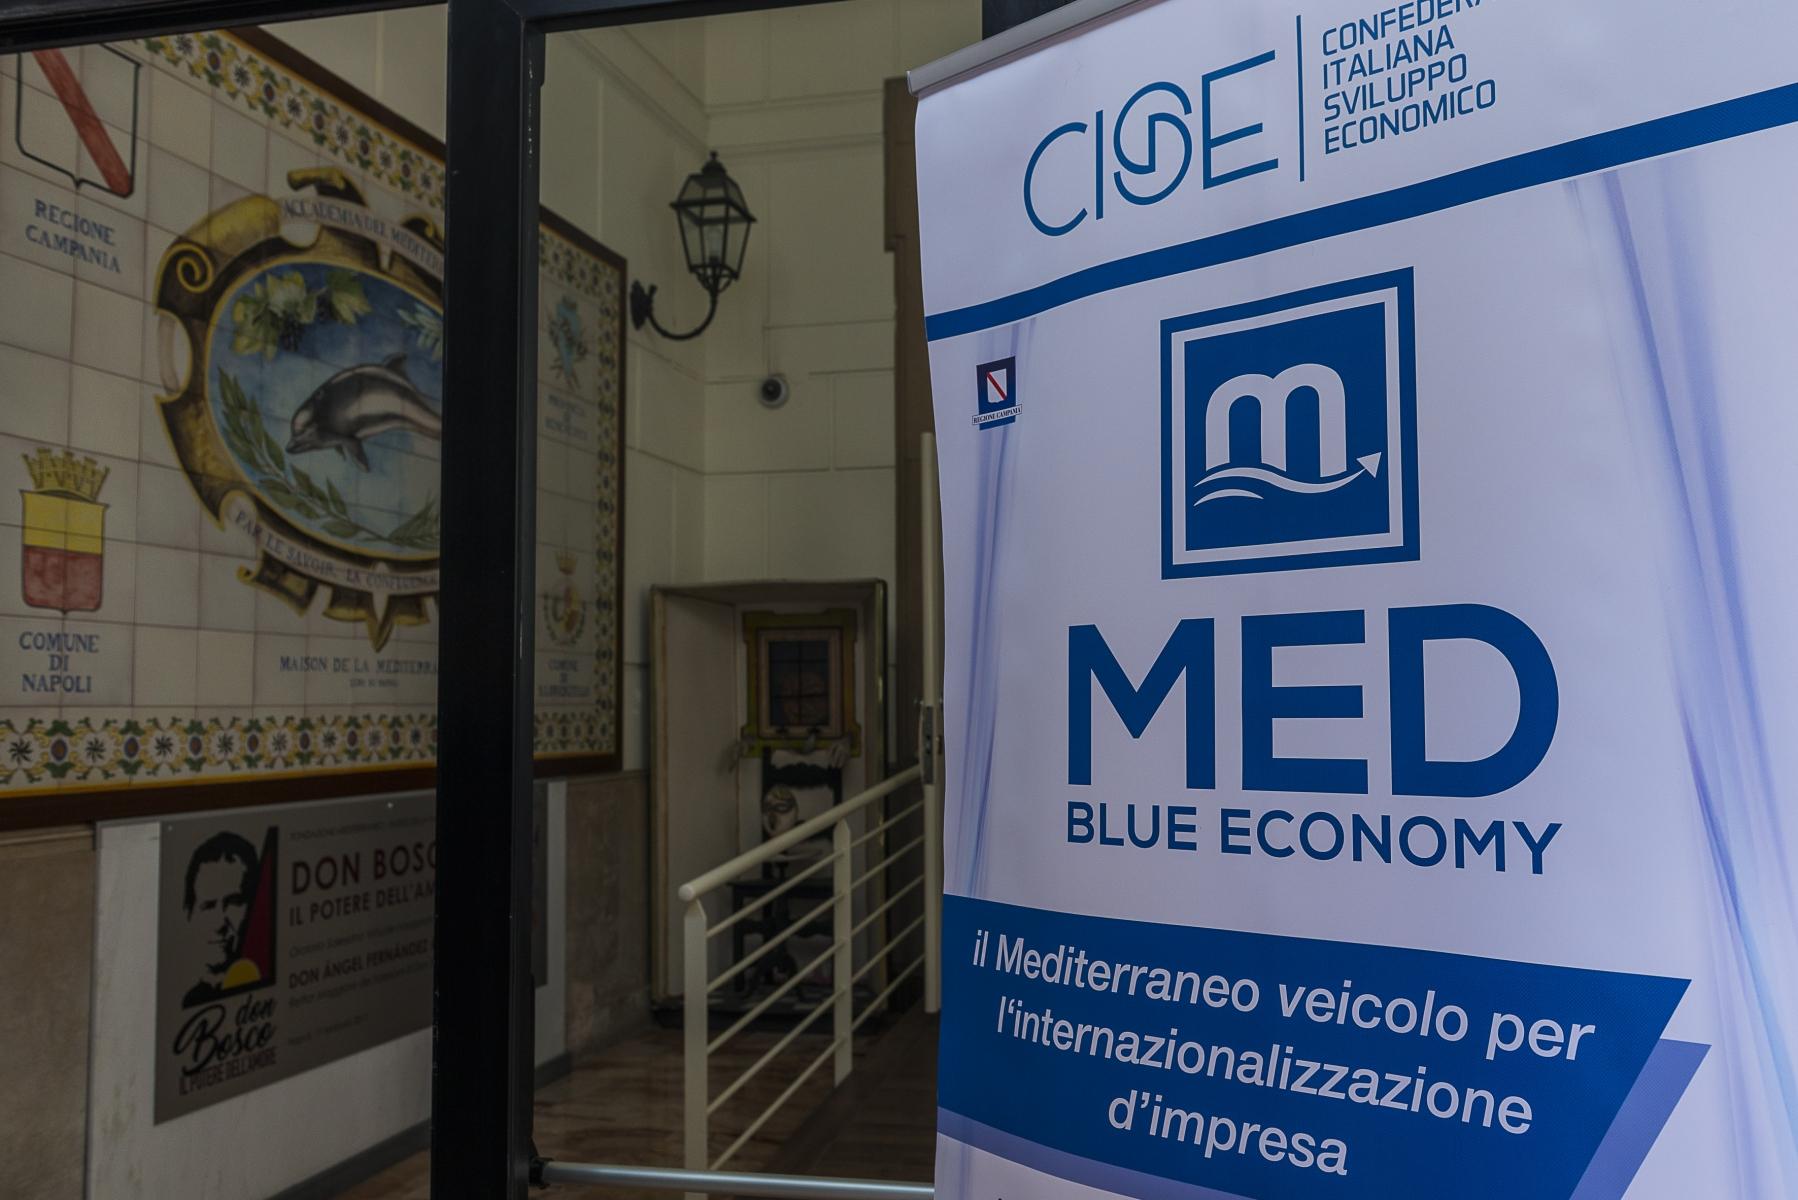 Conferenza Stampa CISE Med Blue Economy - febbraio 2019